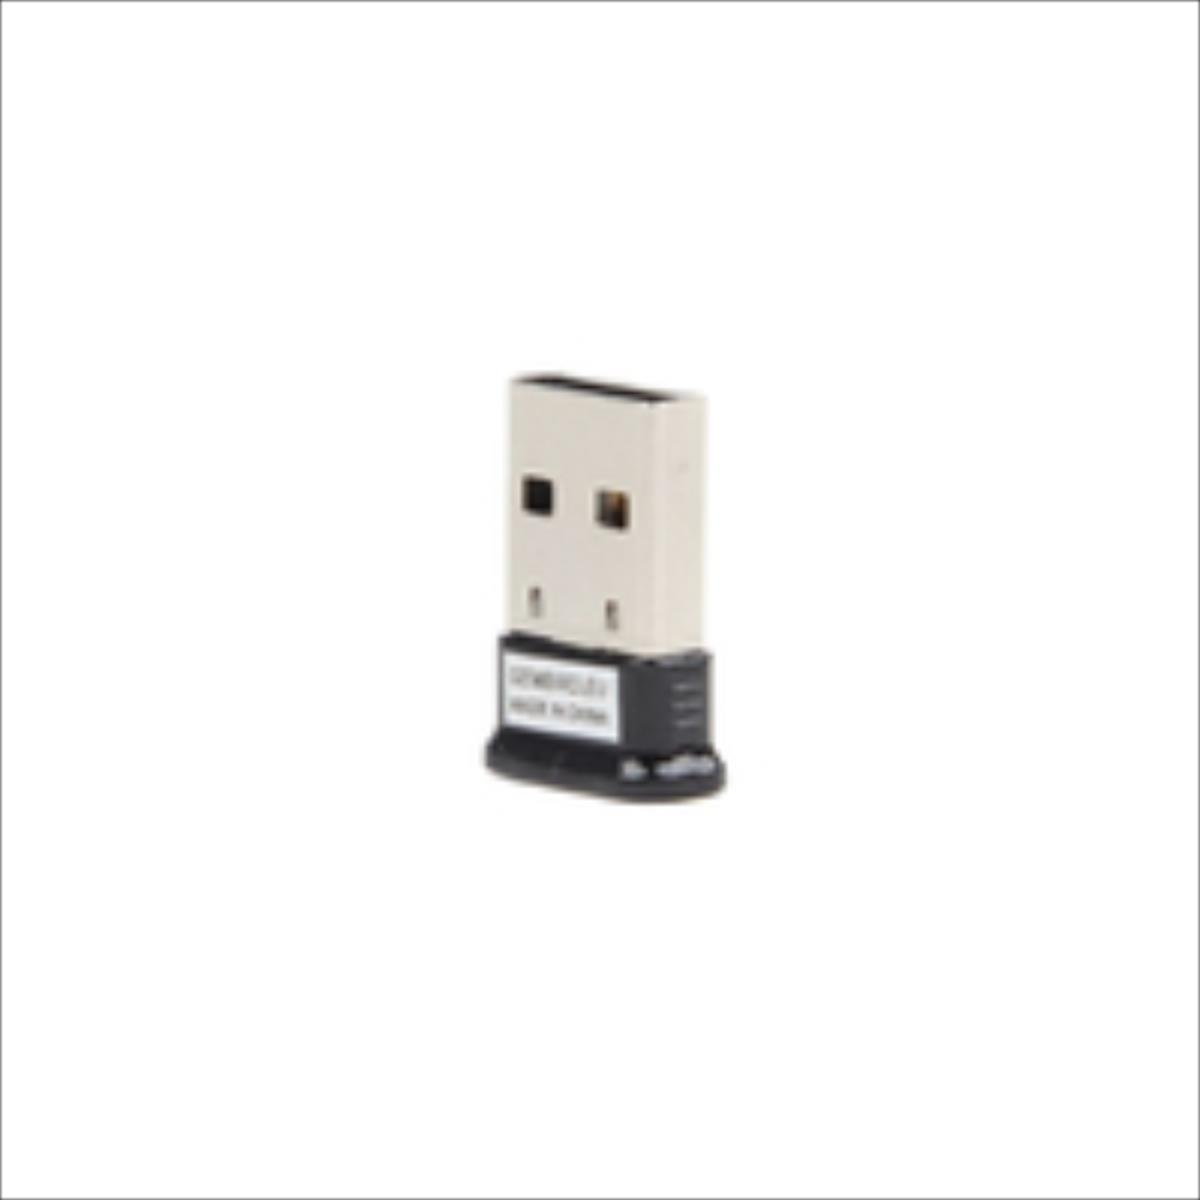 Gembird USB Nano Bluetooth v.4.0 Class II dongle WiFi adapteris